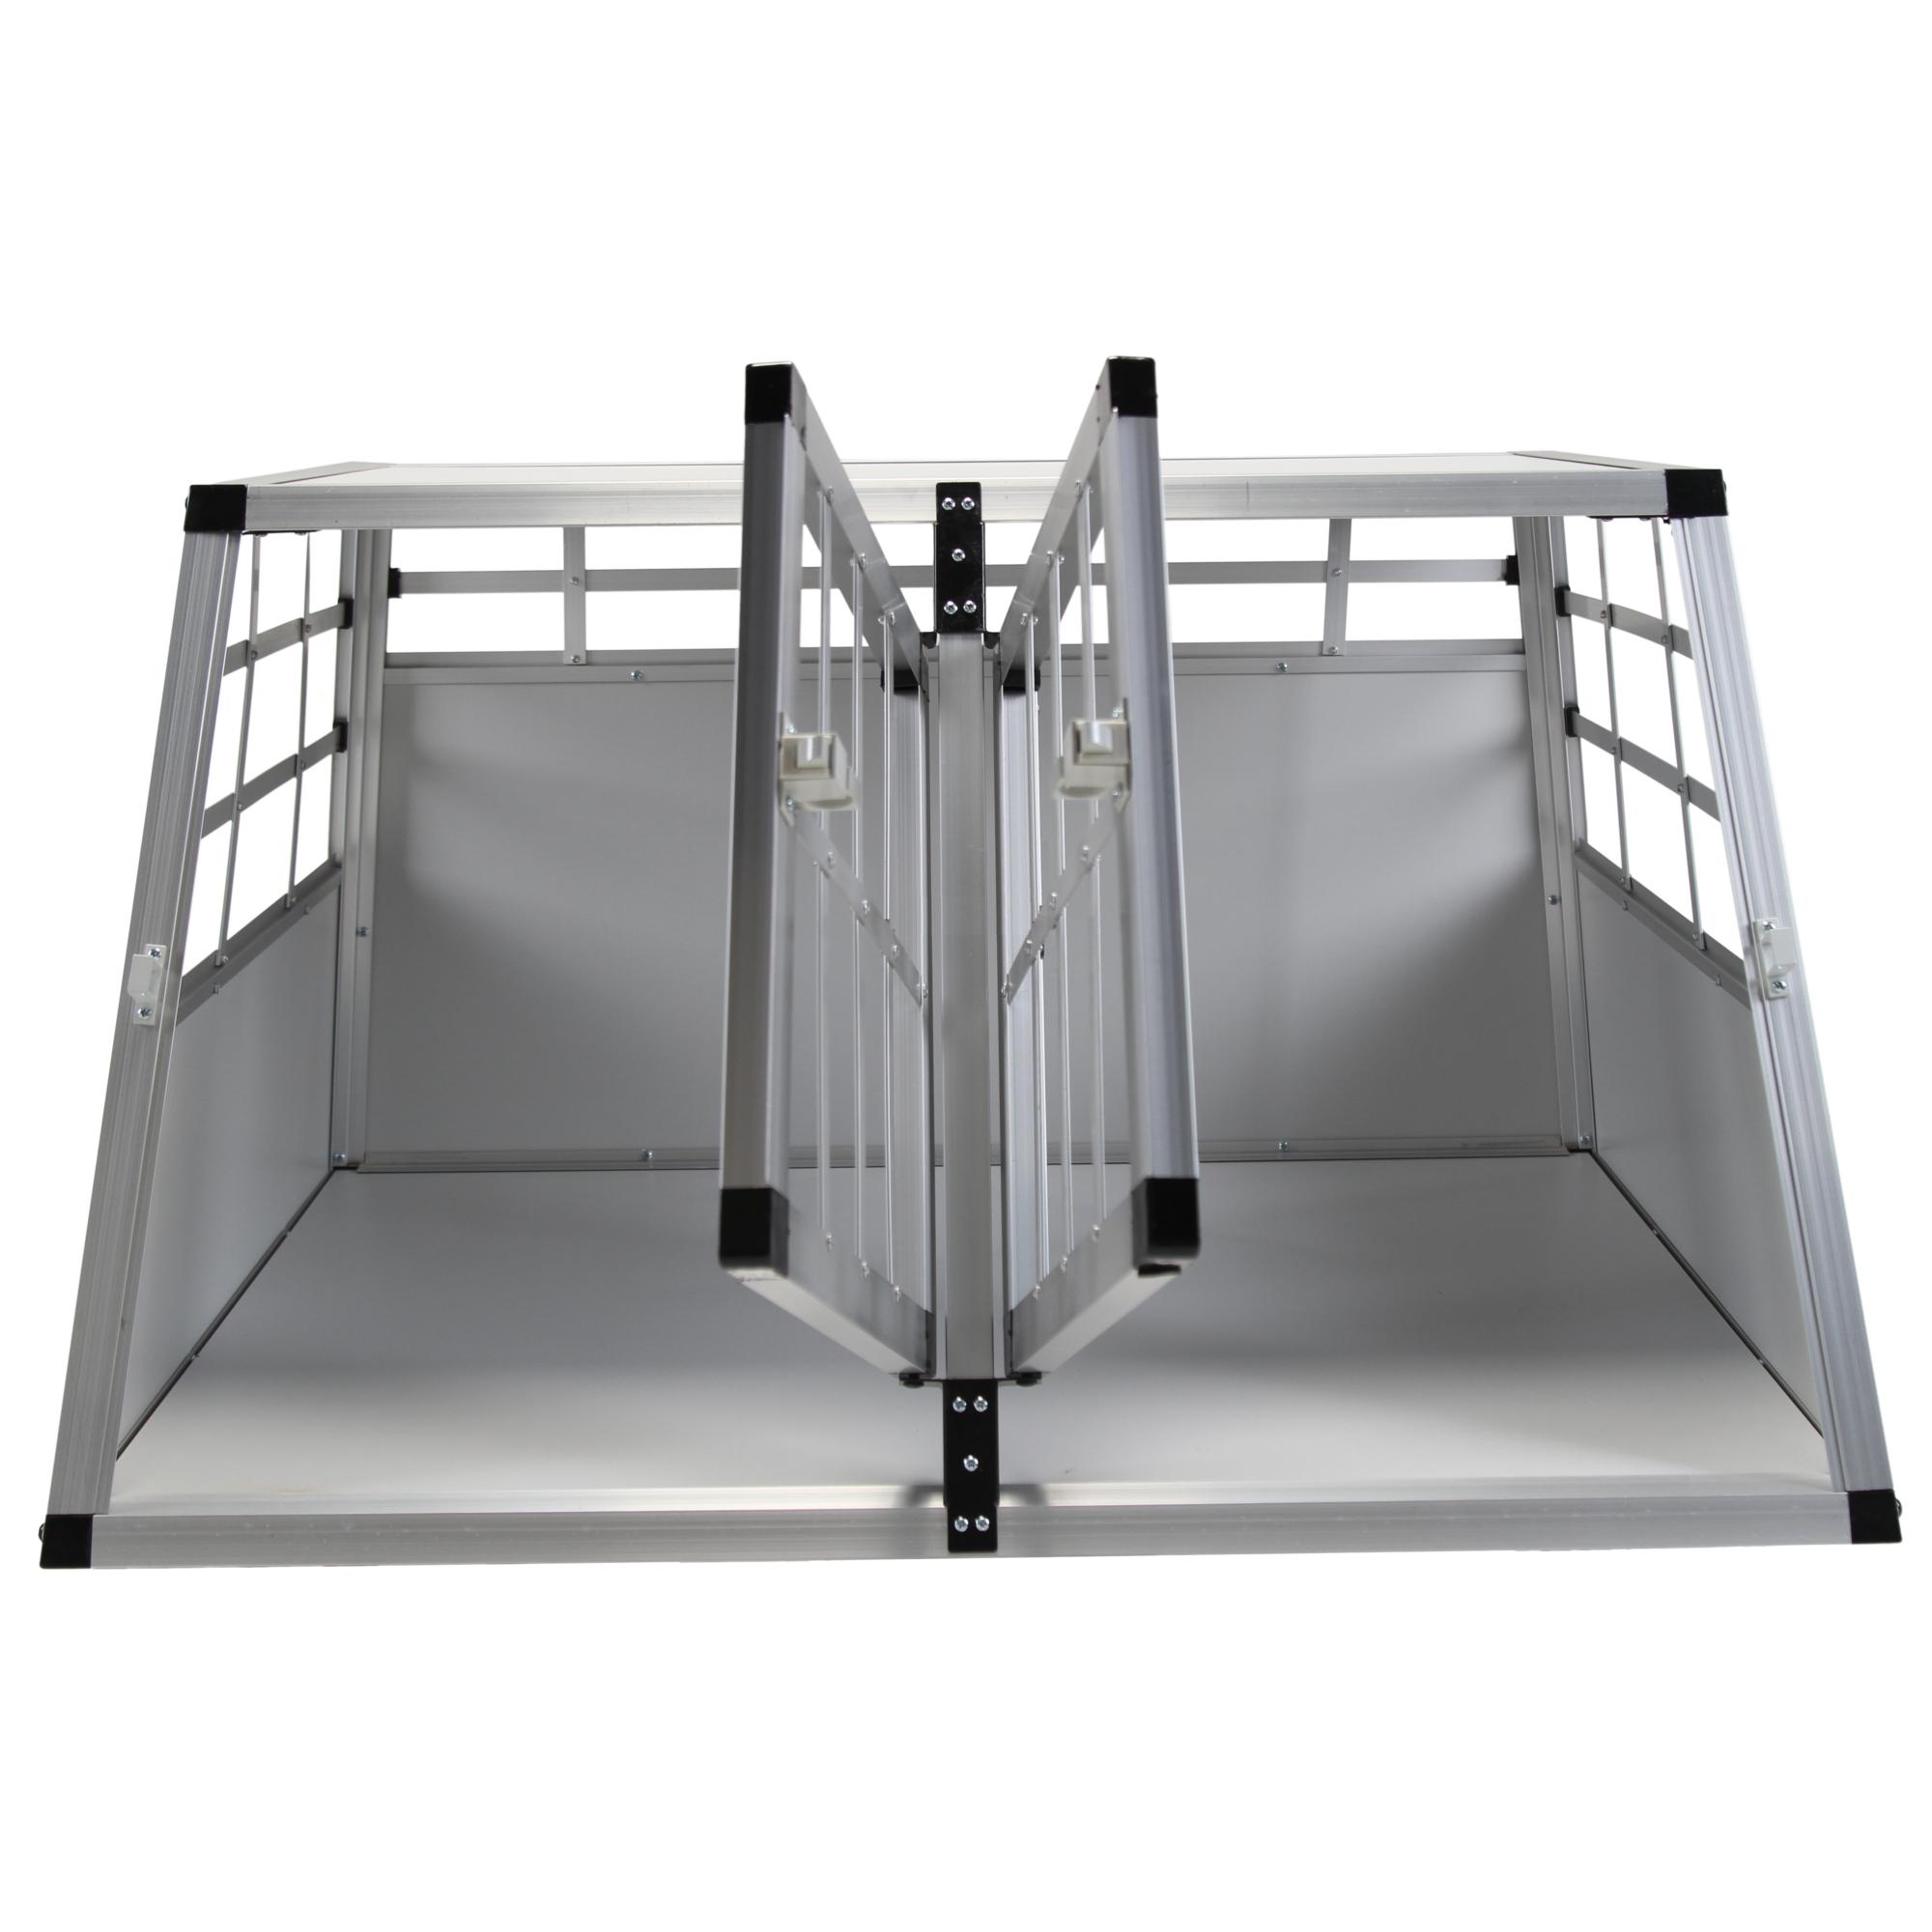 doppel hundetransportbox hundebox transportbox reisebox hunde katzen auto box s ebay. Black Bedroom Furniture Sets. Home Design Ideas